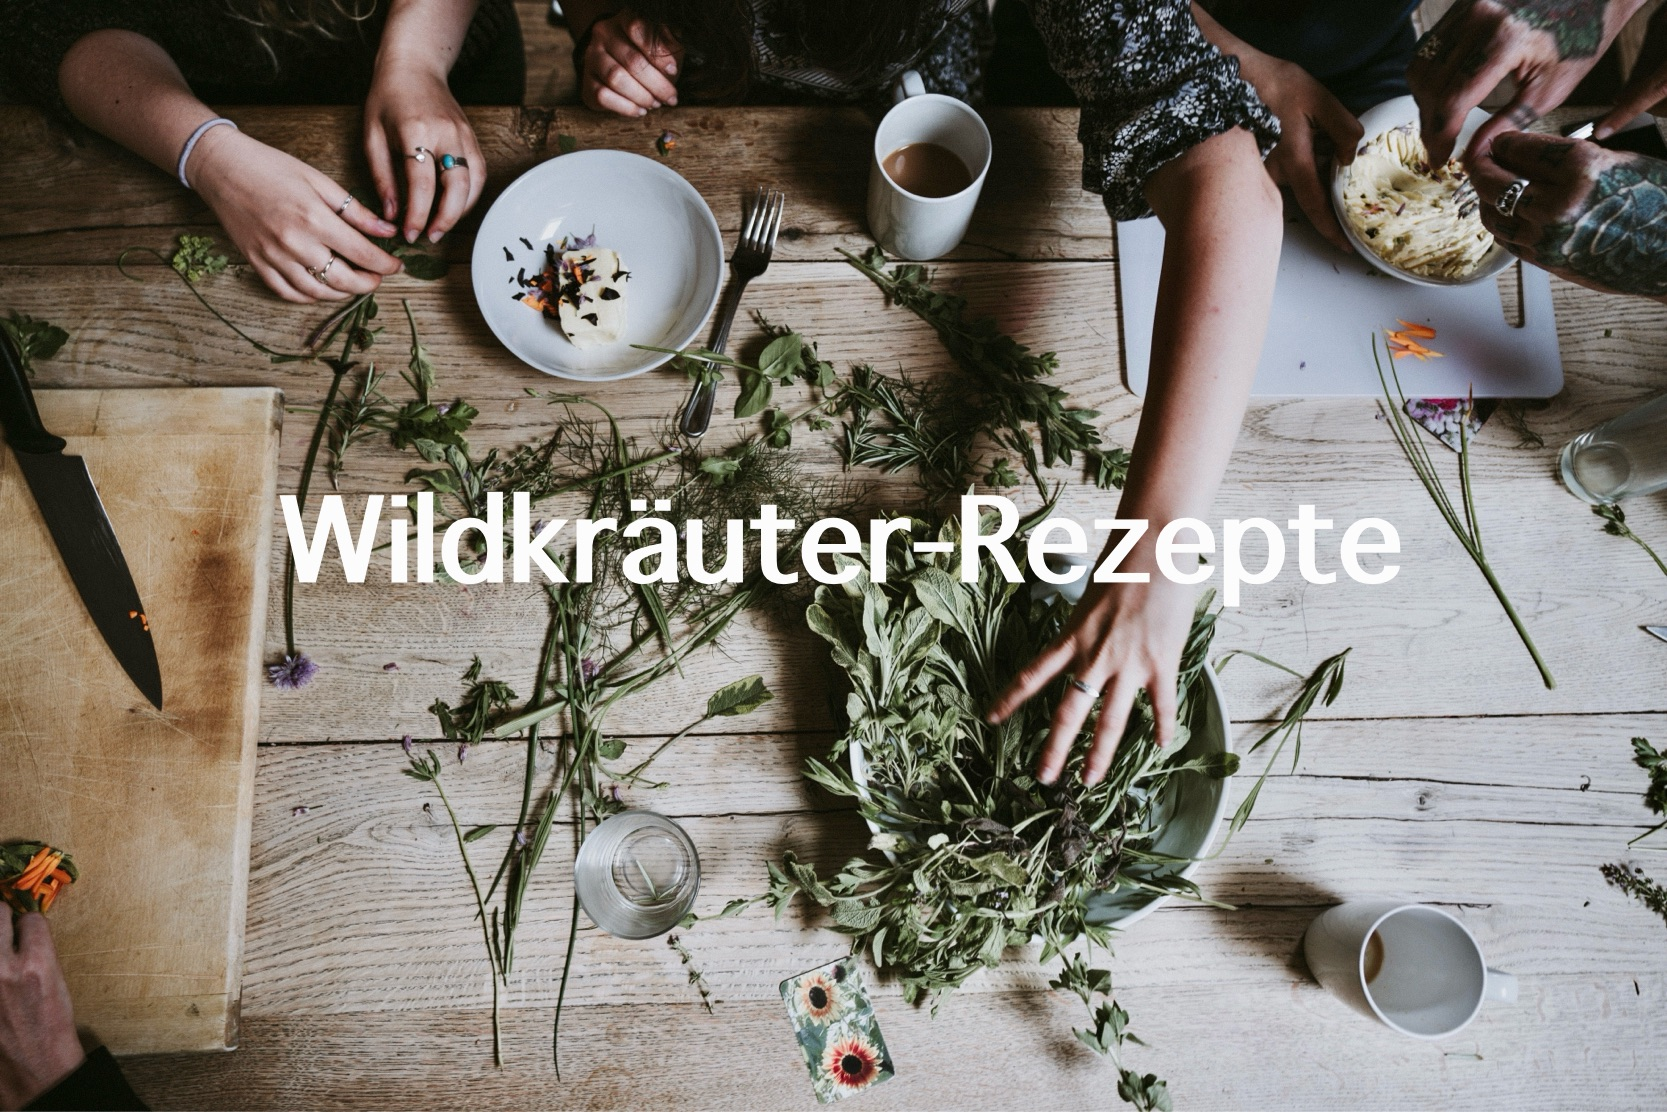 You are currently viewing Wildkräuter-Rezepte